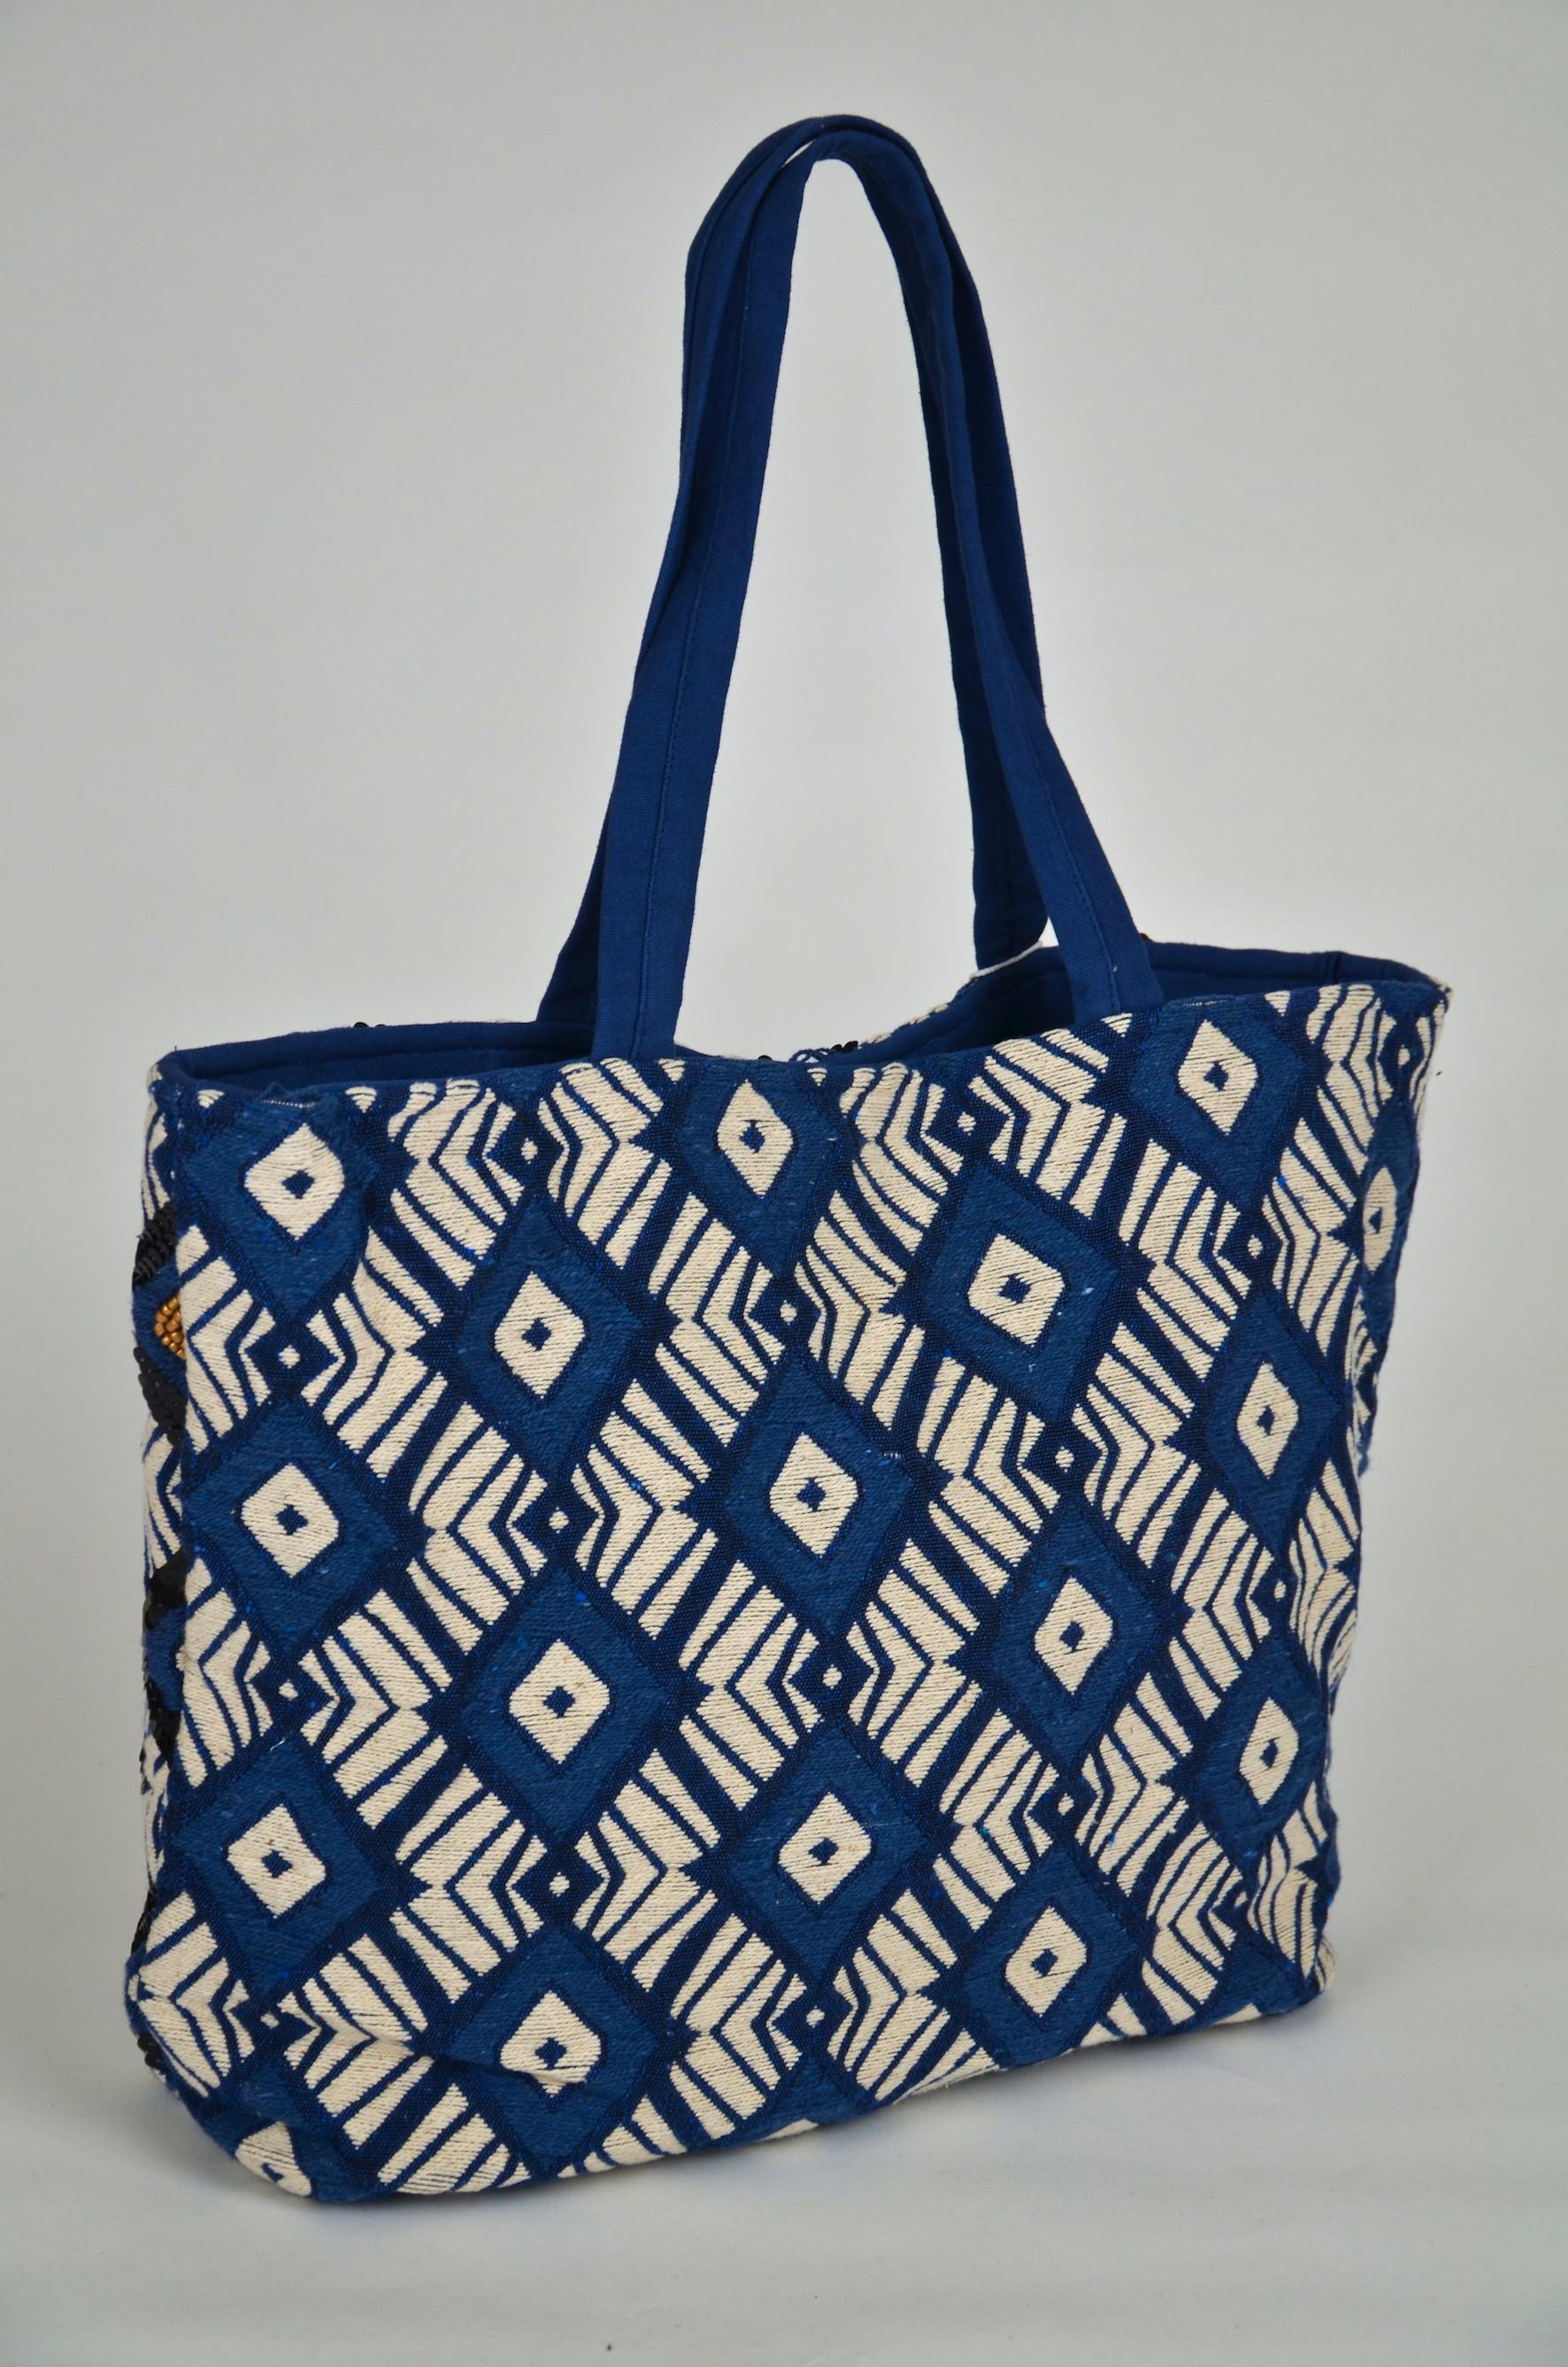 28f2ac65332b Продукция раздела Пляжные сумки на www.modamia.kiev.ua страница ...